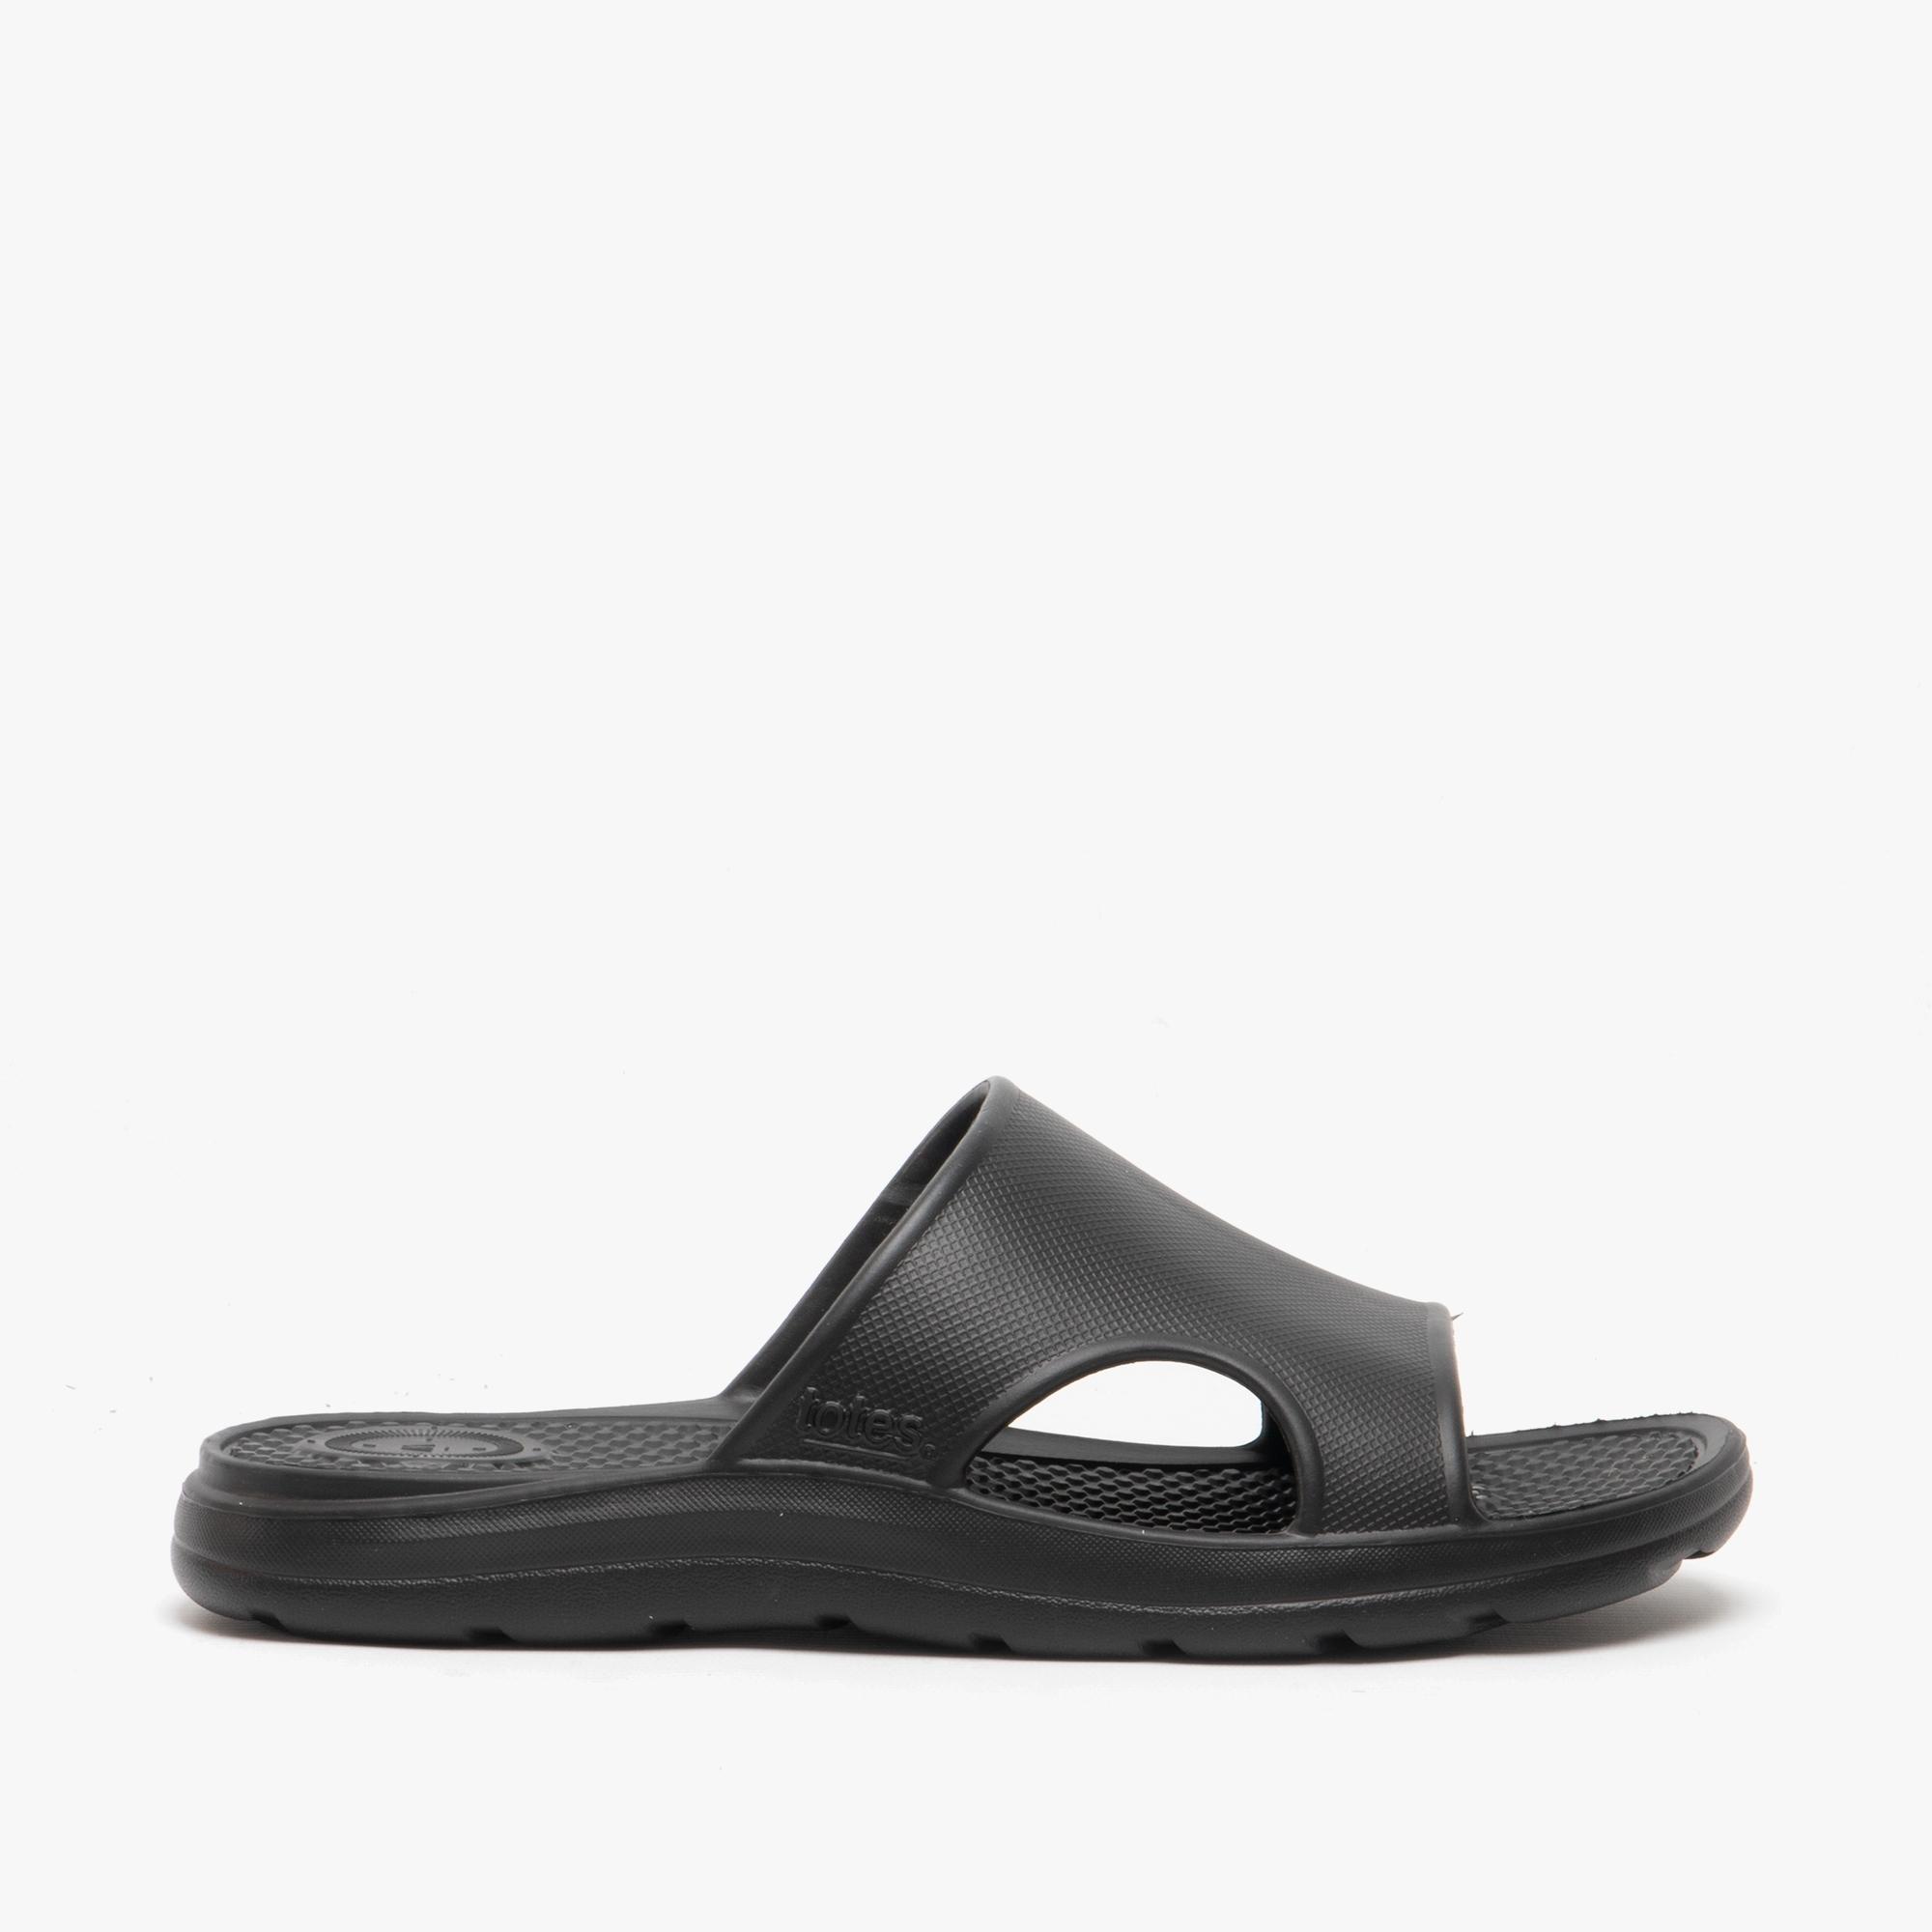 Totes Sol Bounce 20 Mens Everywear Slide Sandals Black